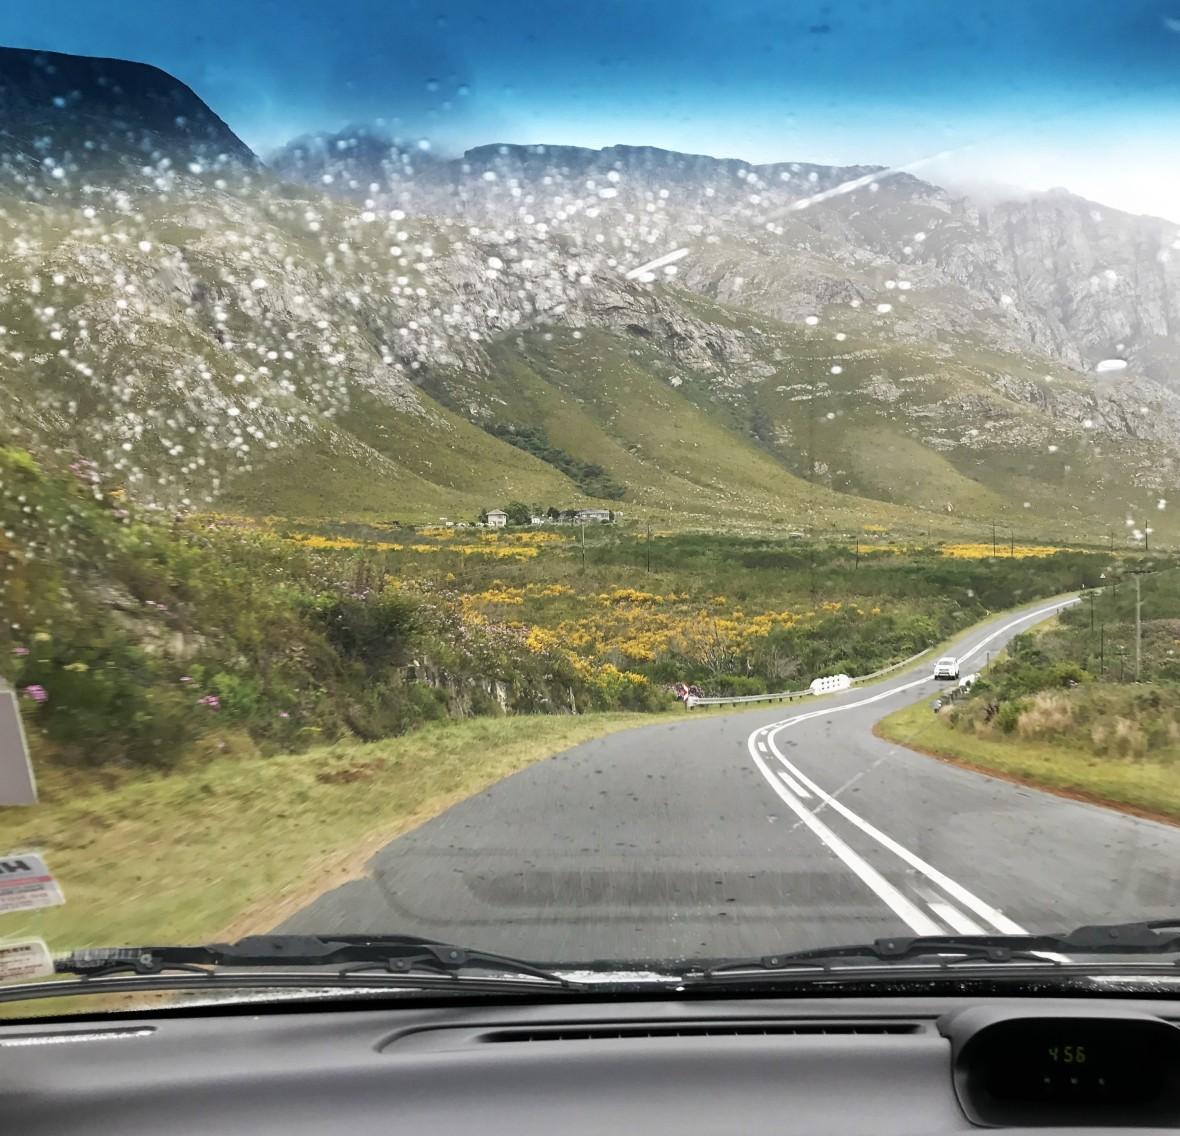 raining-garden-route-south-africa